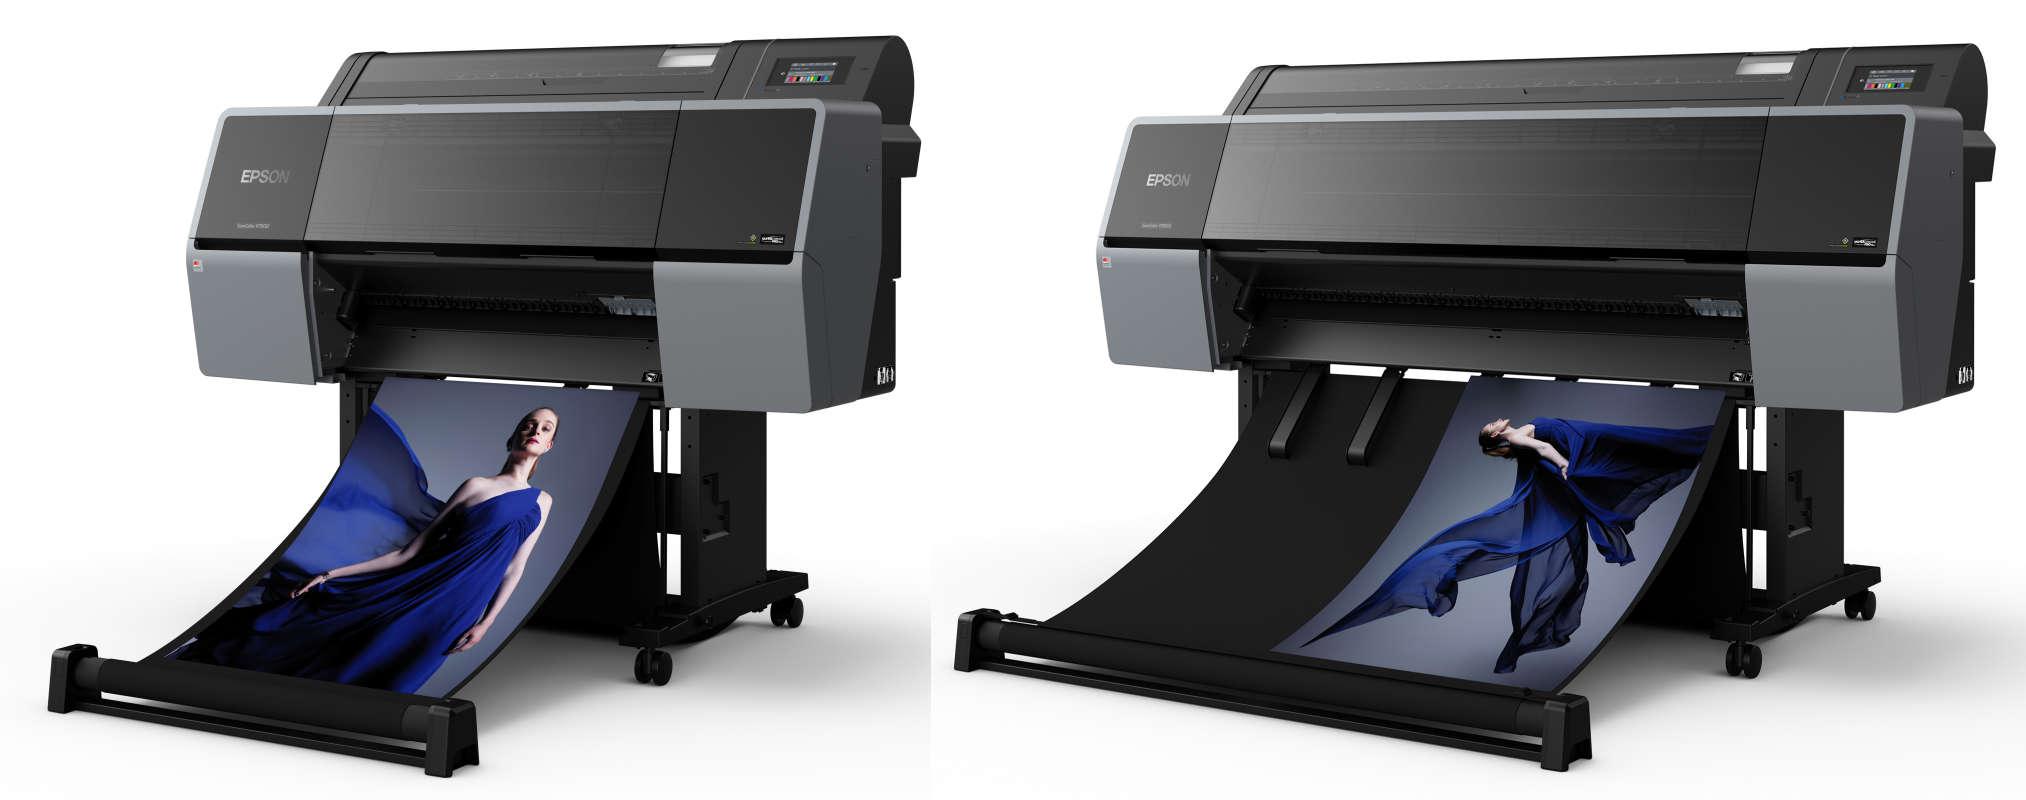 Epson SC P7500/9500